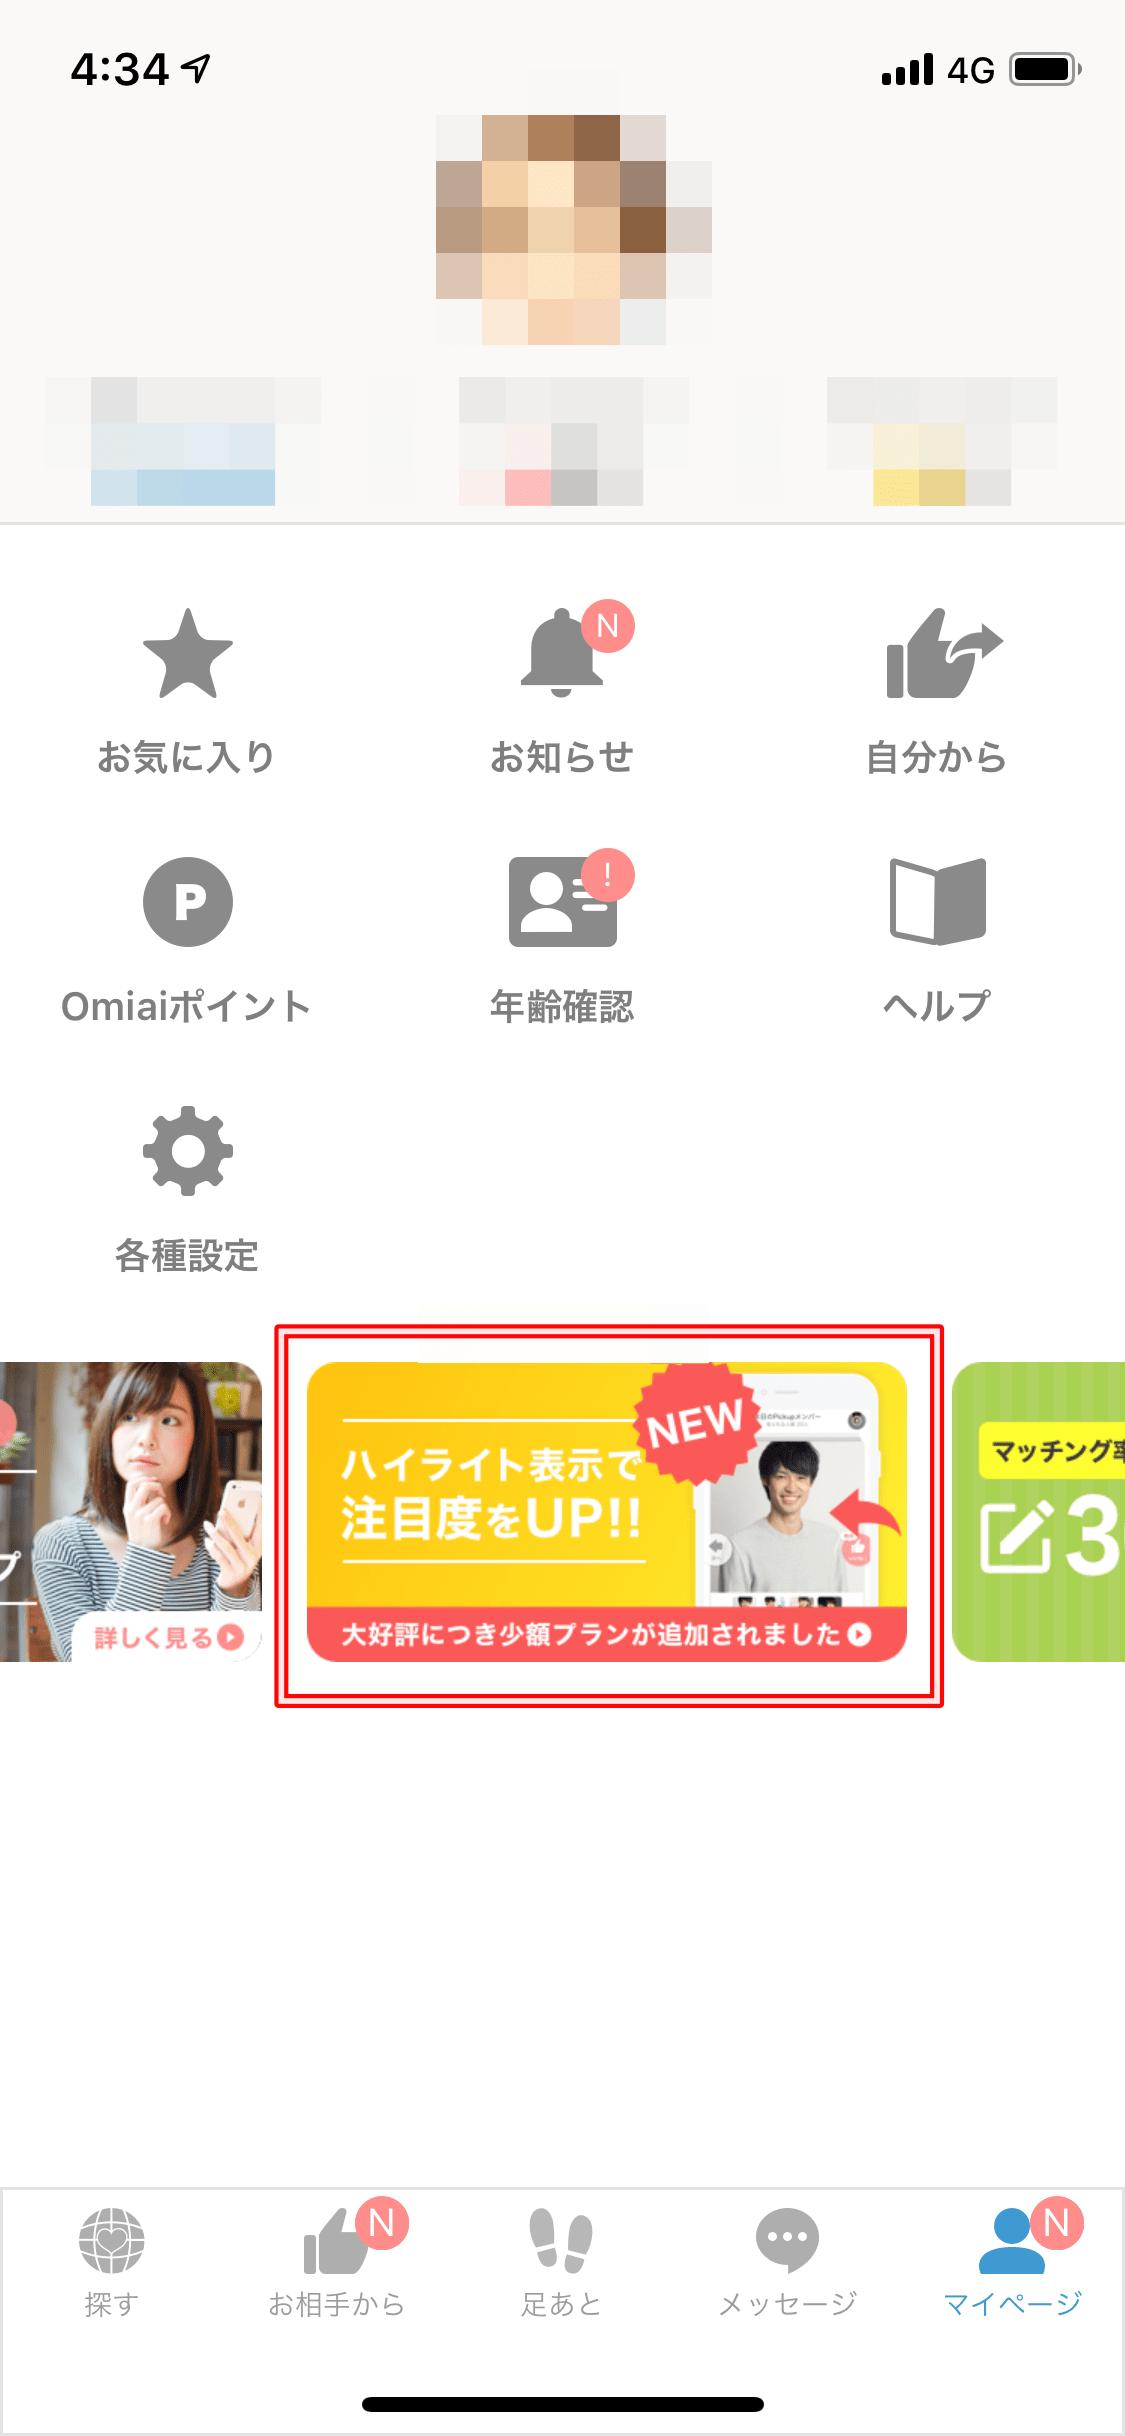 omiaiマイページ